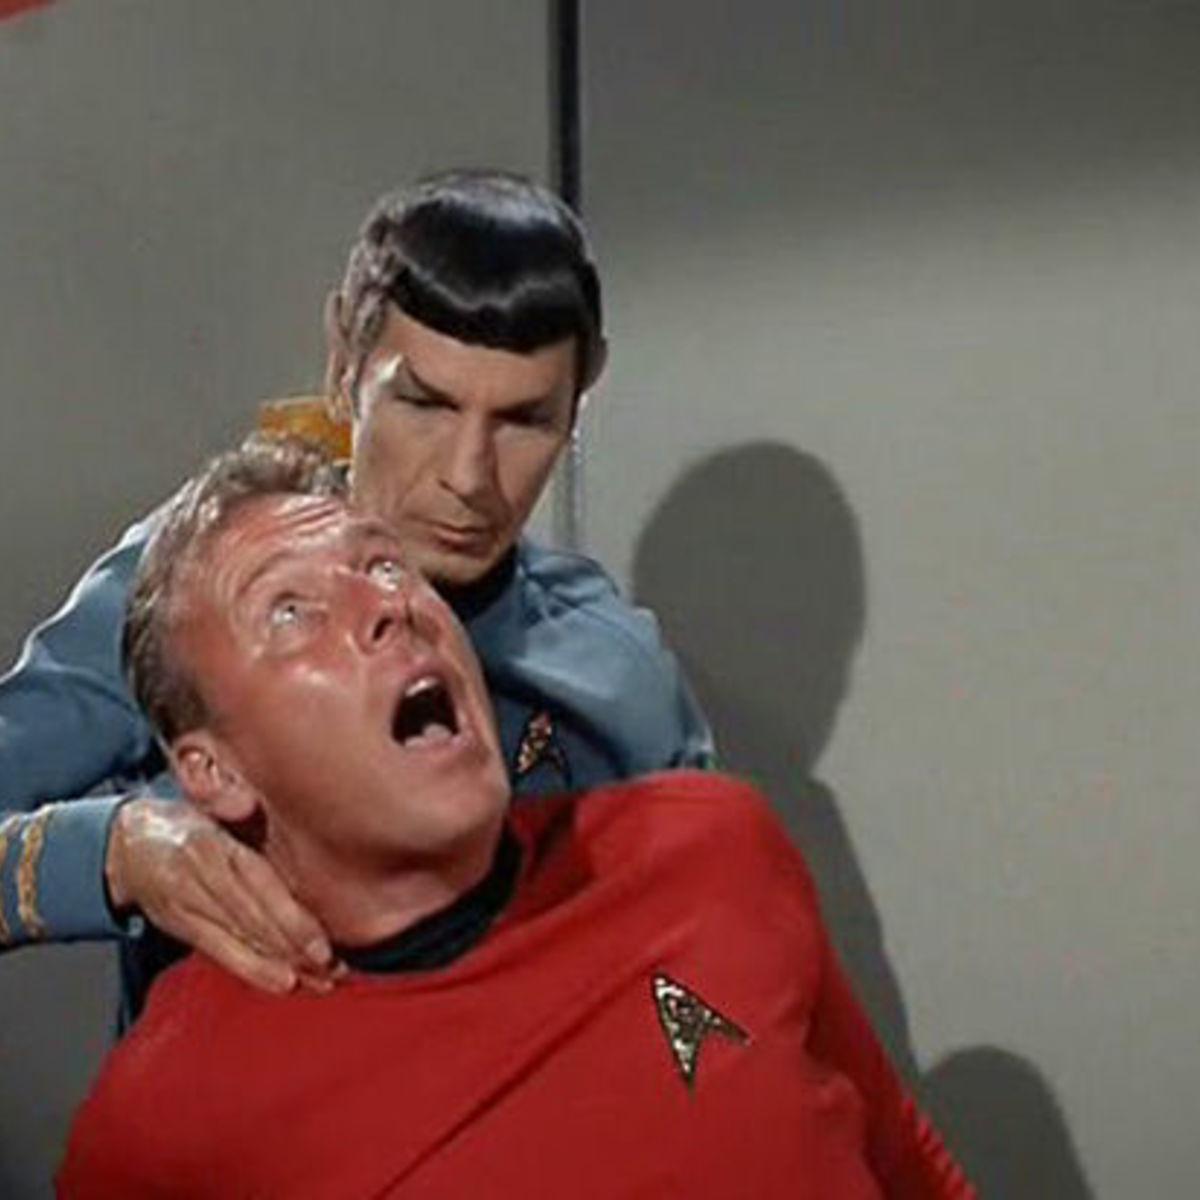 Star_Trek_Vulcannervepinch.jpg